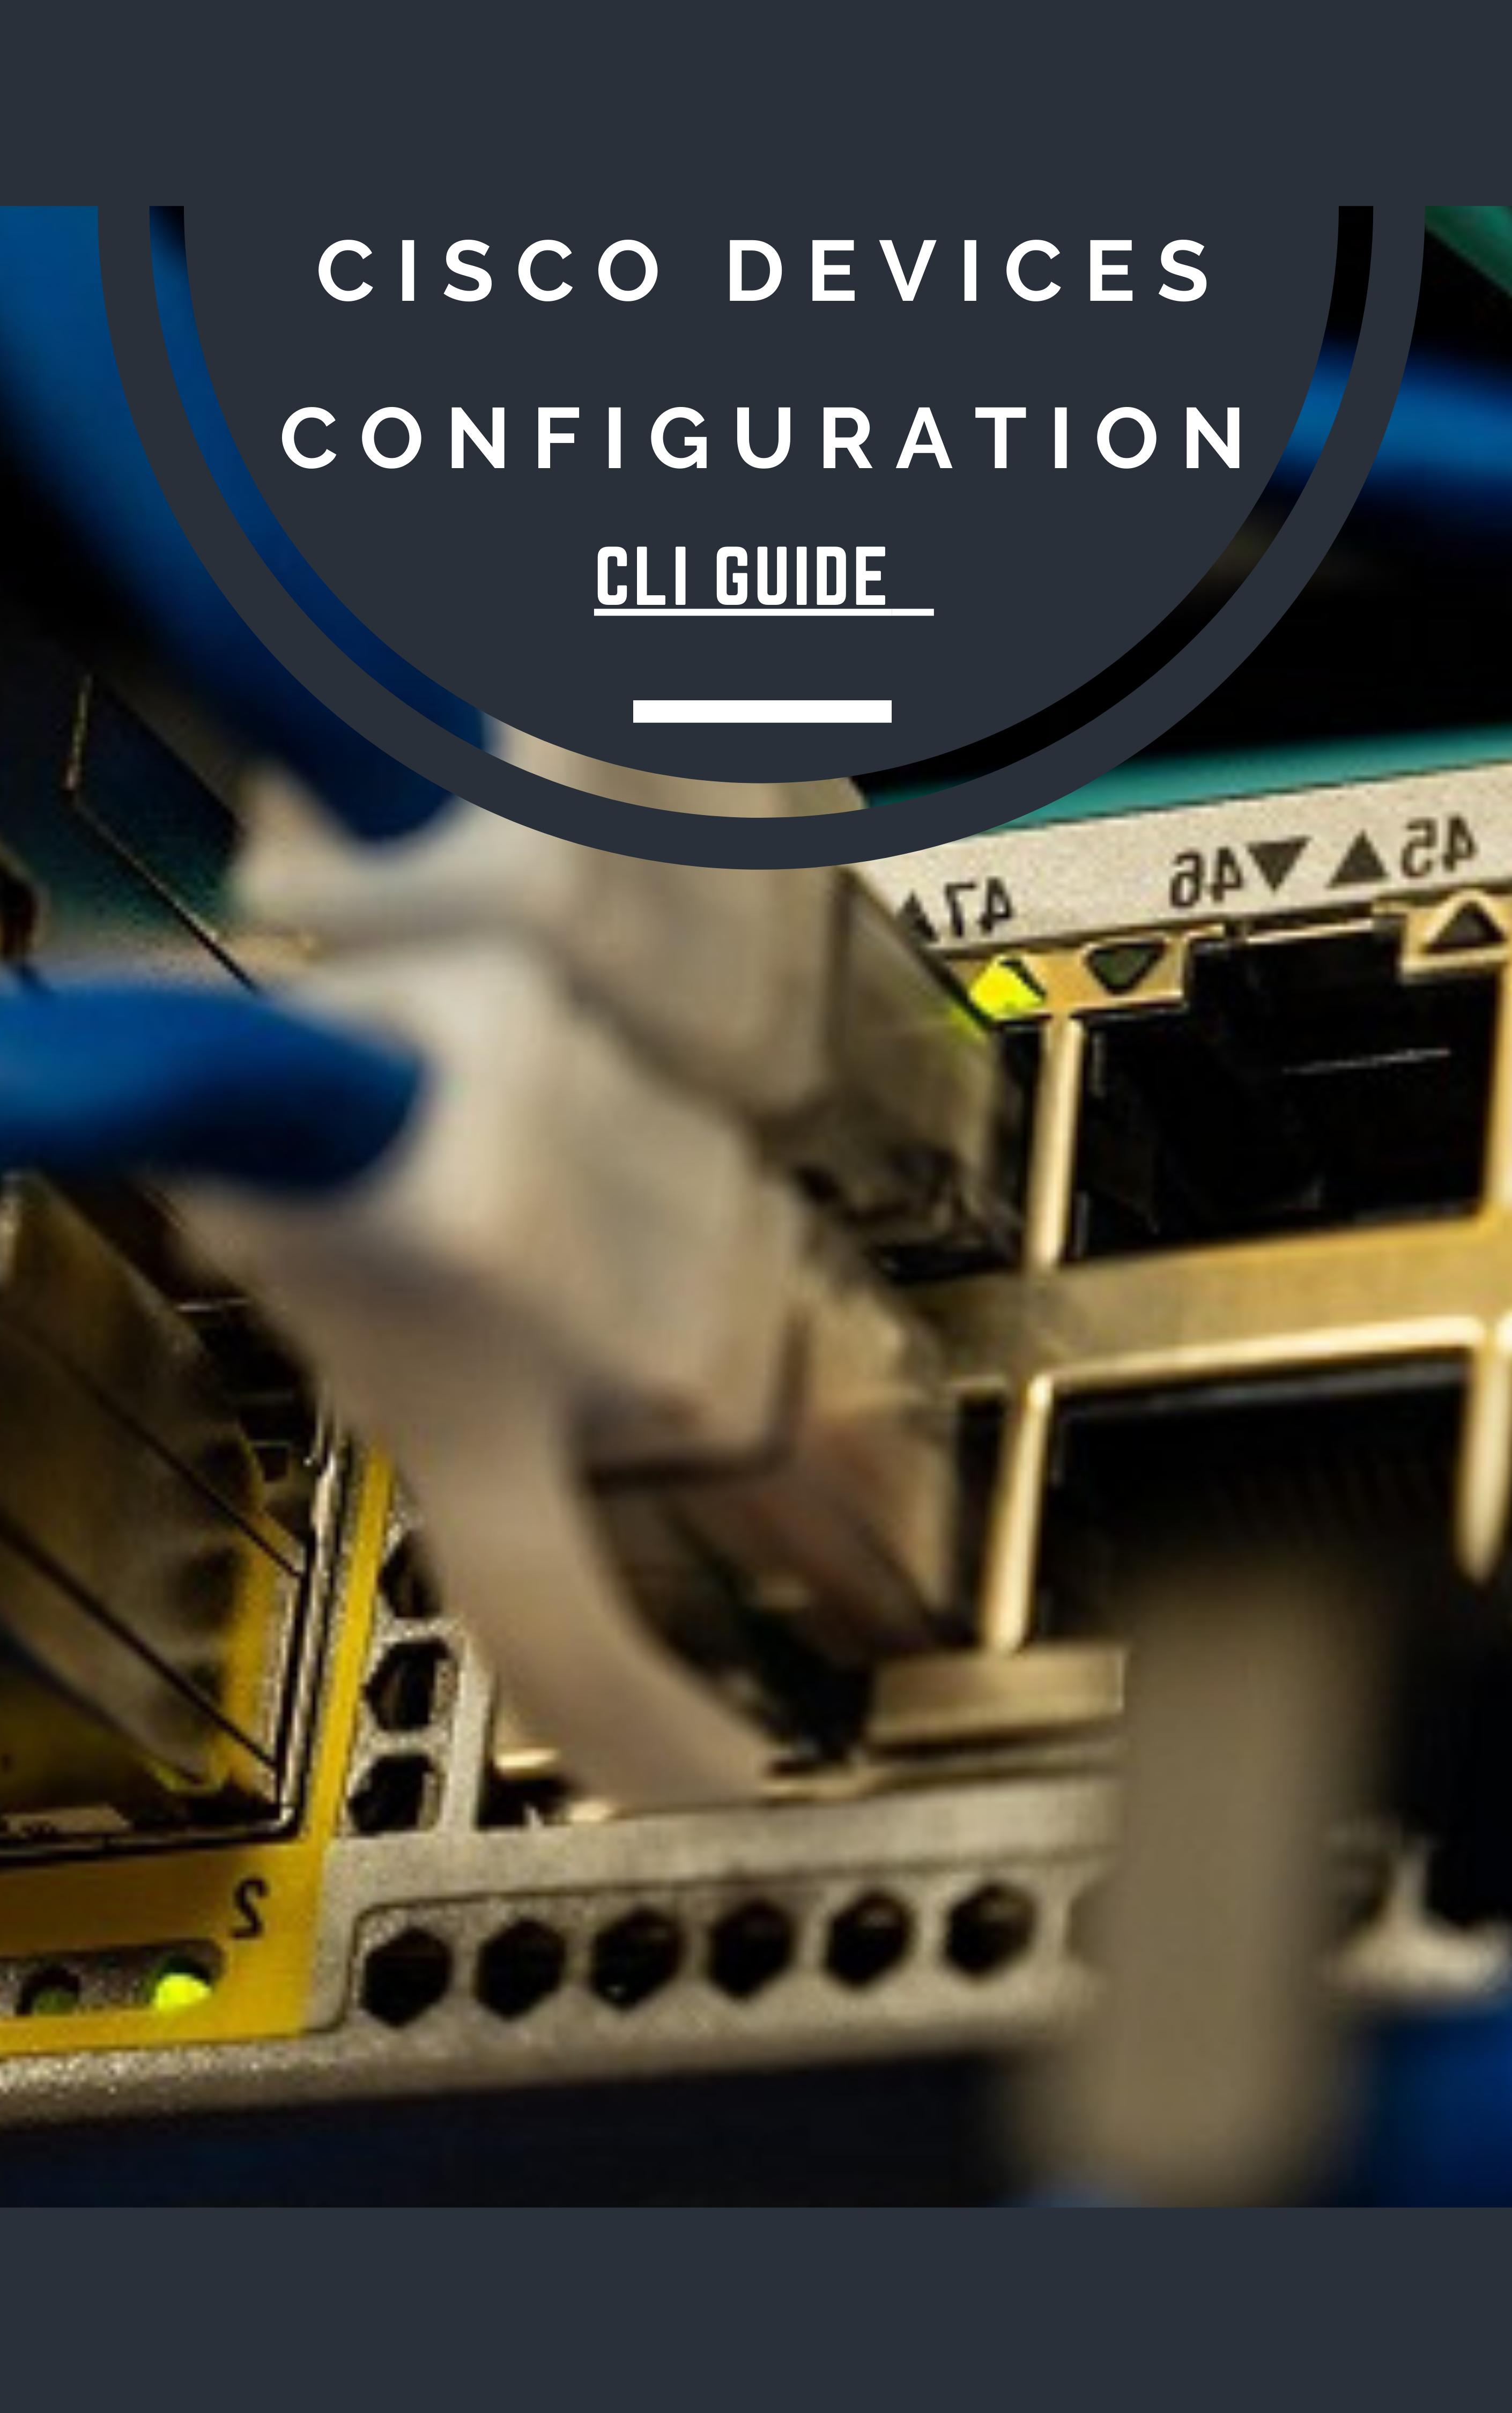 CISCO IOS Configuration Step by Step -CLI GUIDE